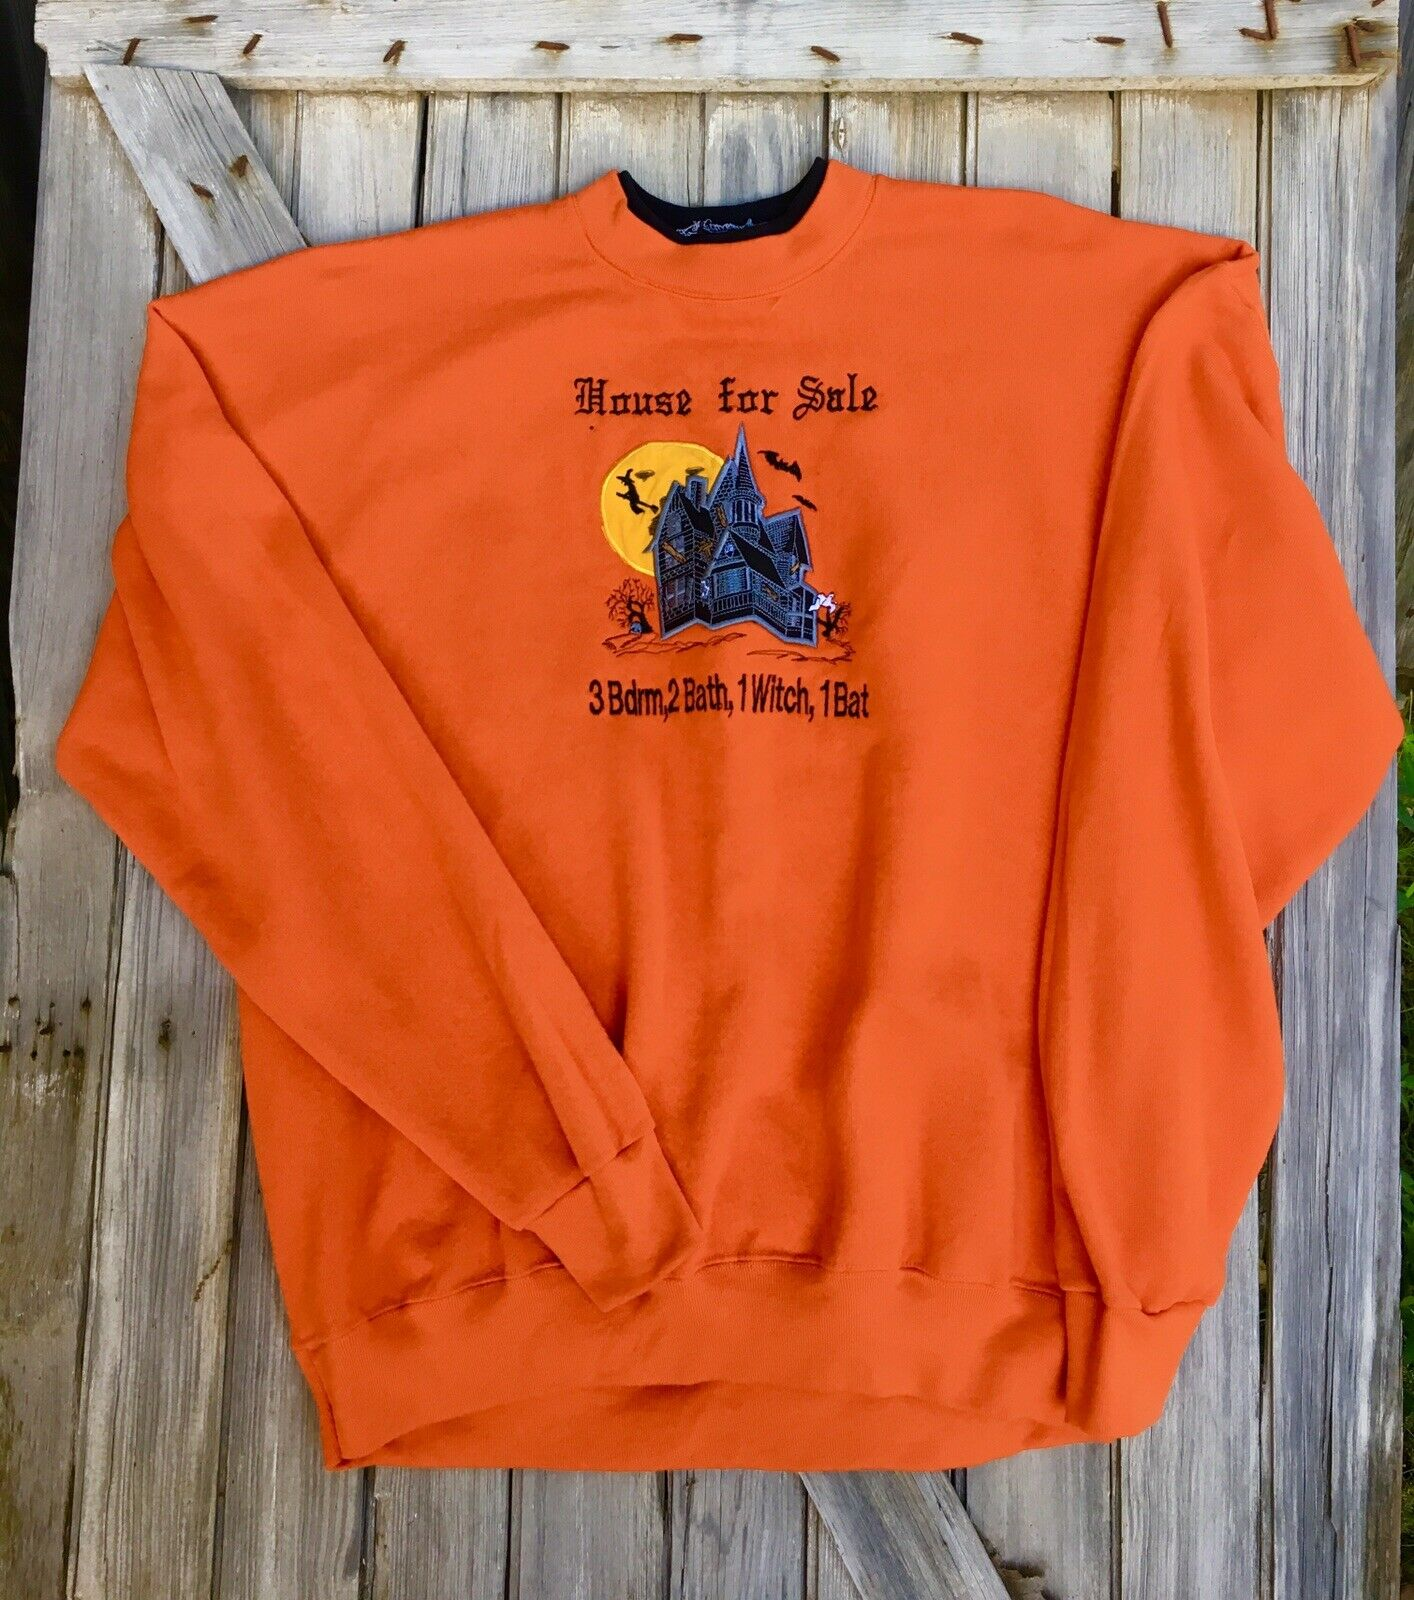 Vintage 1990s 2X Halloween Sweatshirt American Sportswear Tag Embroidered